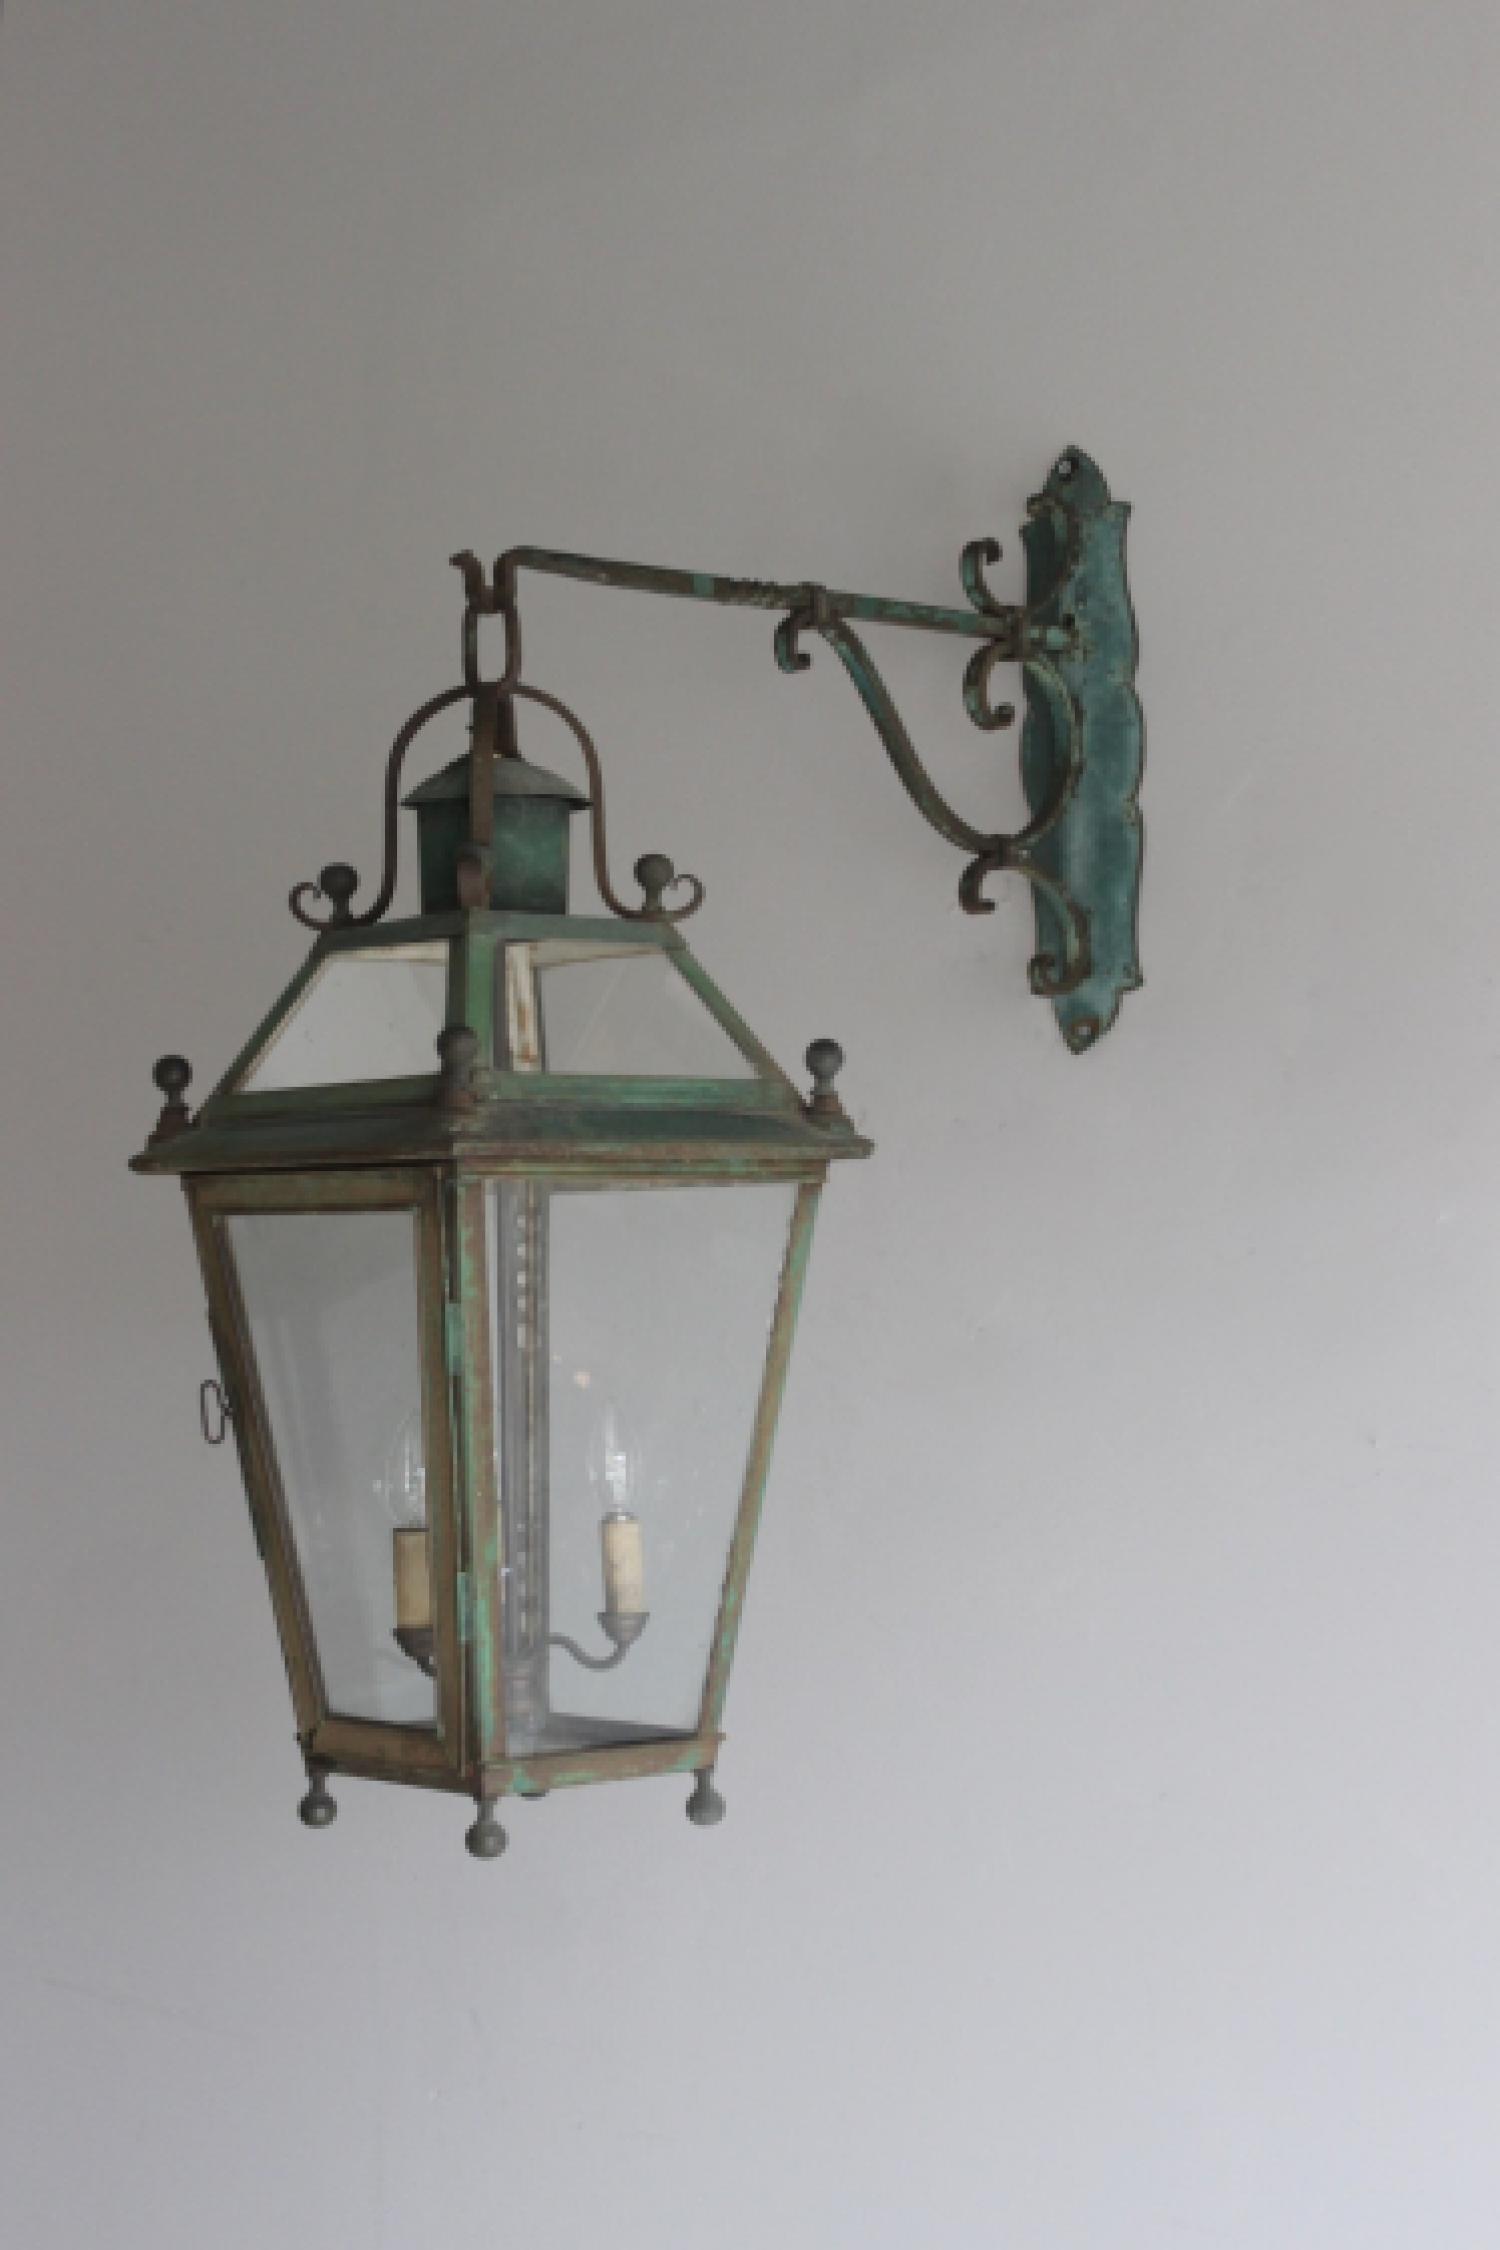 Antique Lighting   For Outside   Image 3